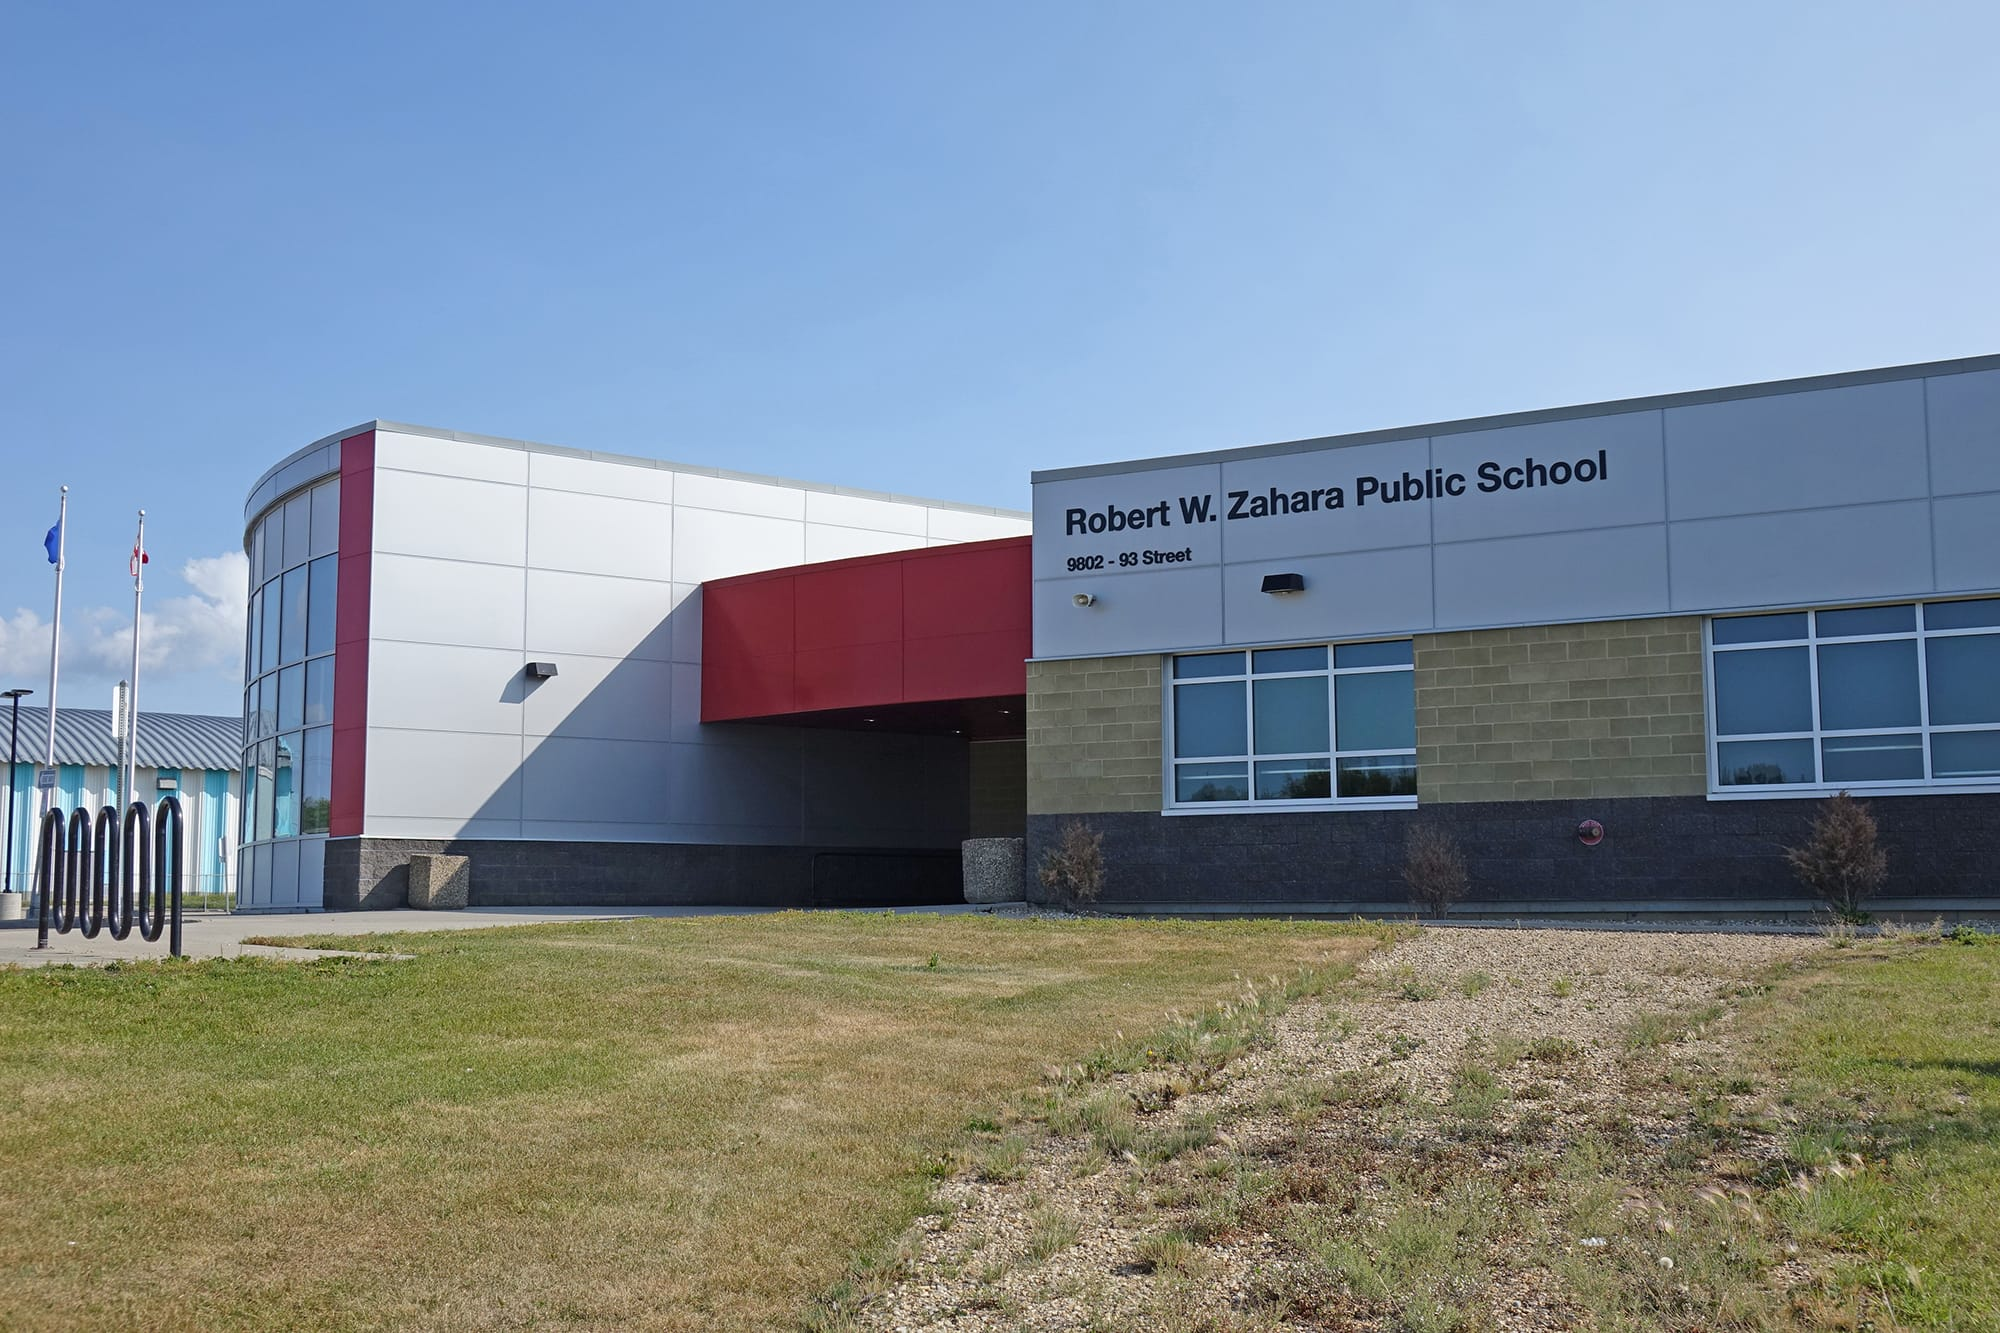 Robert W Zahara Public School exterior entrance